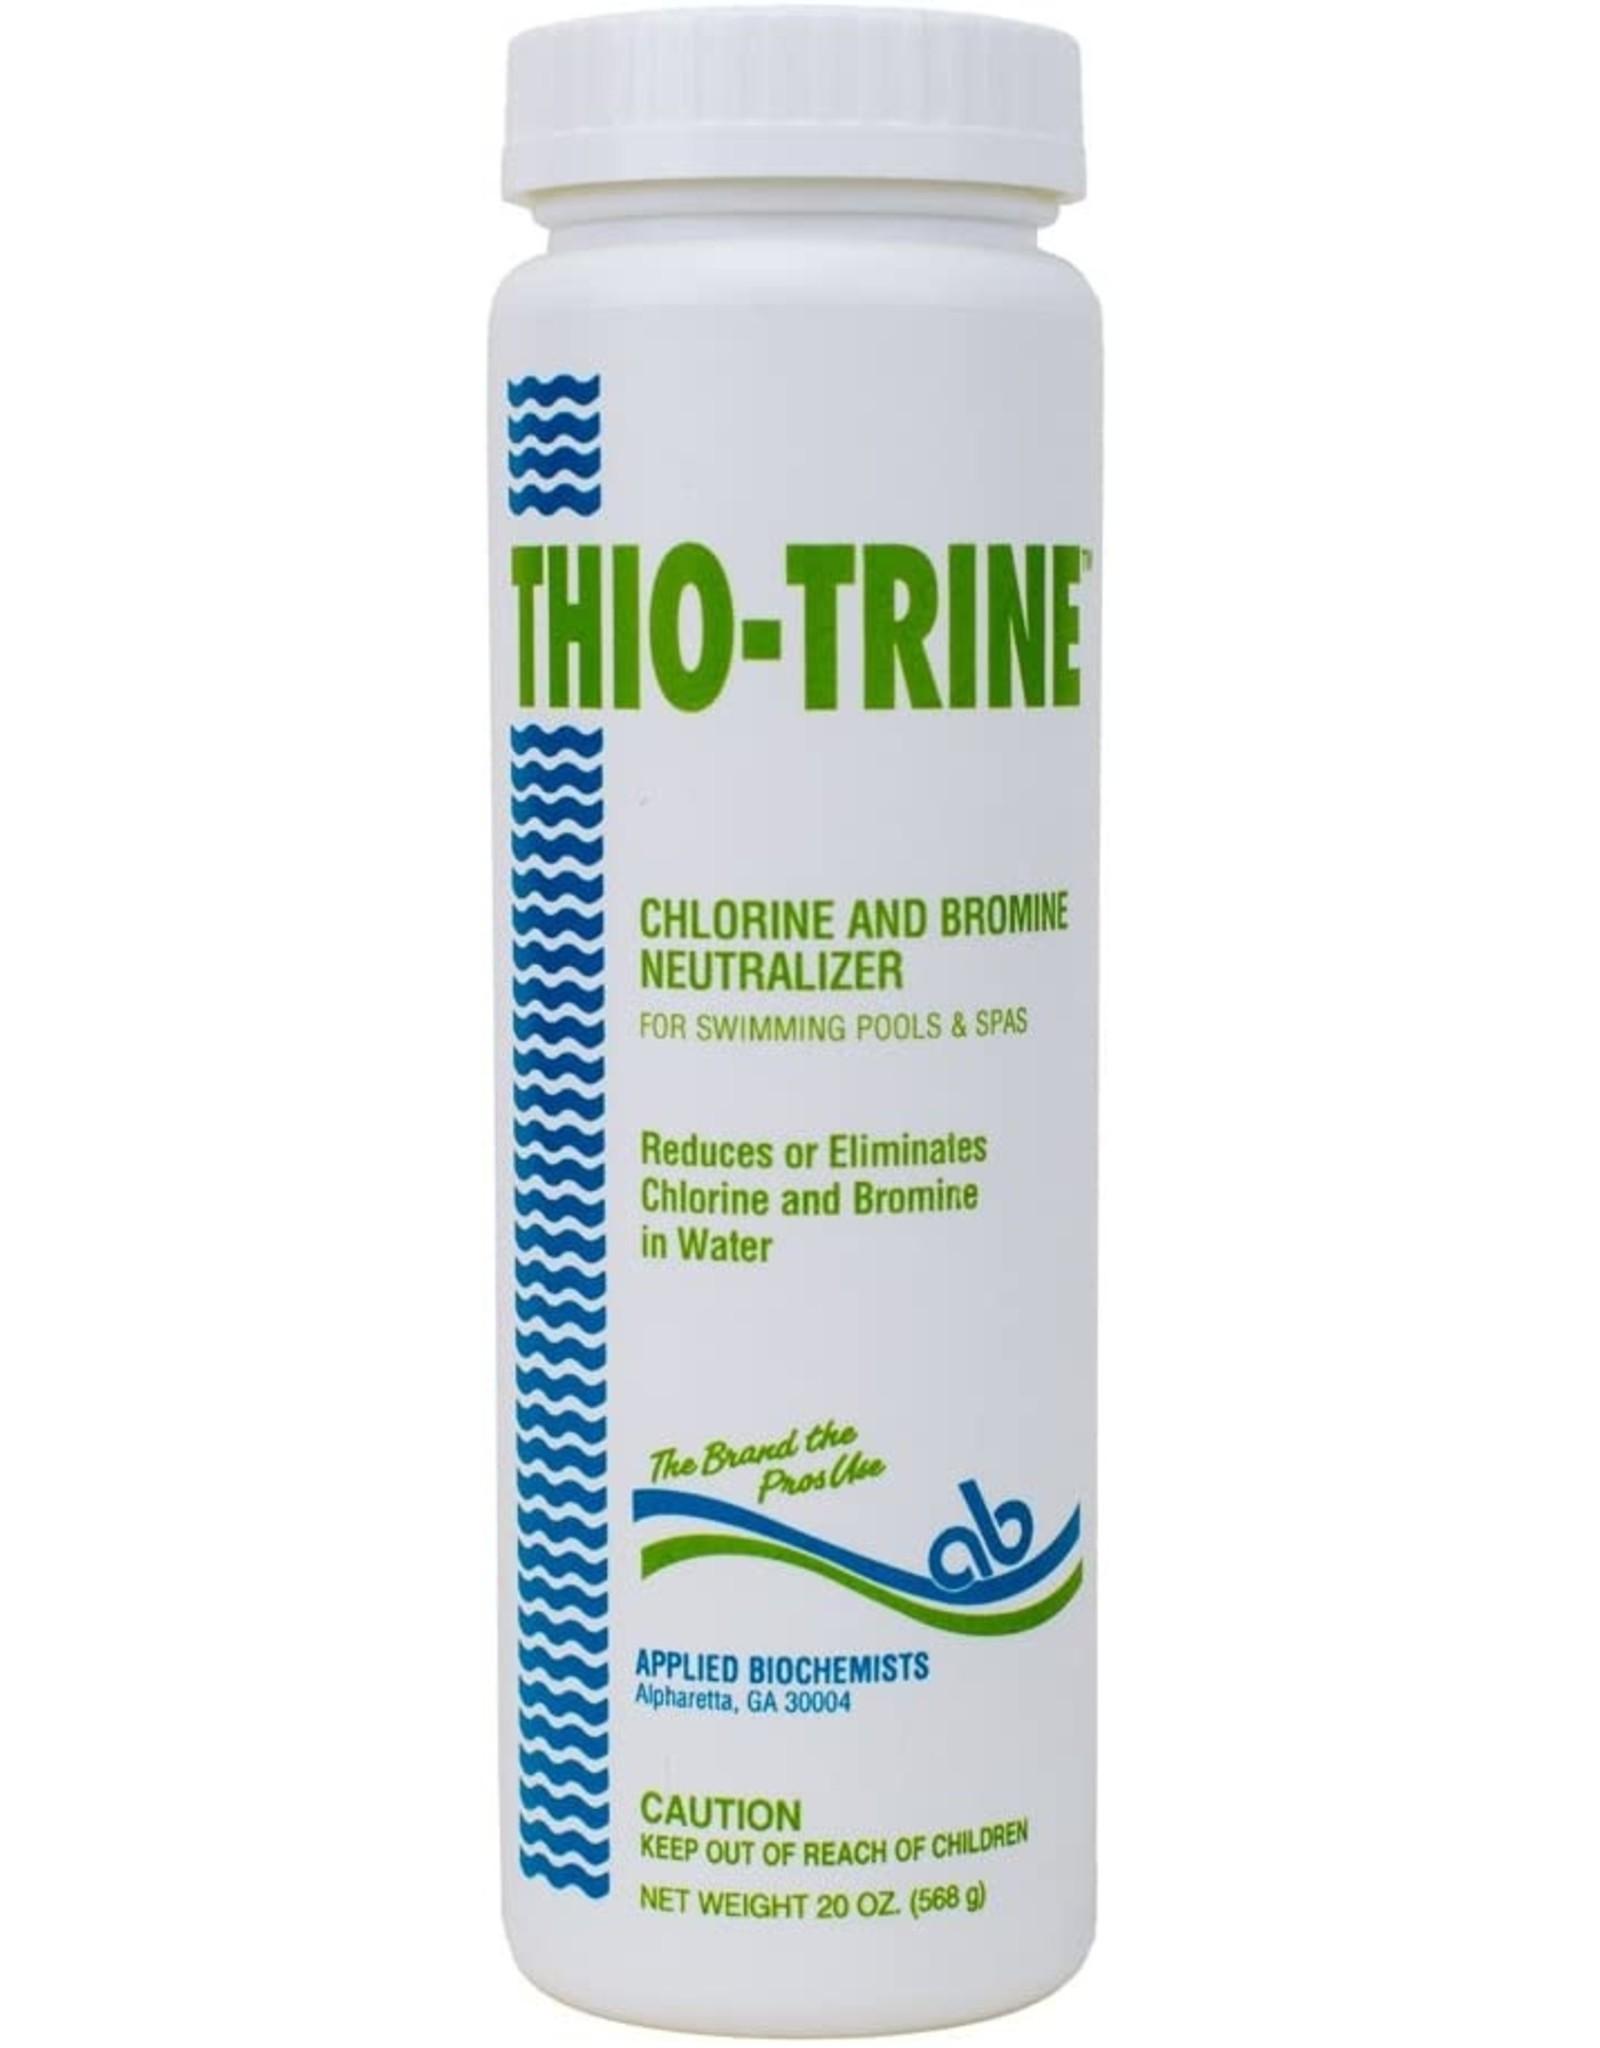 Applied Biochemist Thio-Trine Chlorine & Bromine Neutralizer